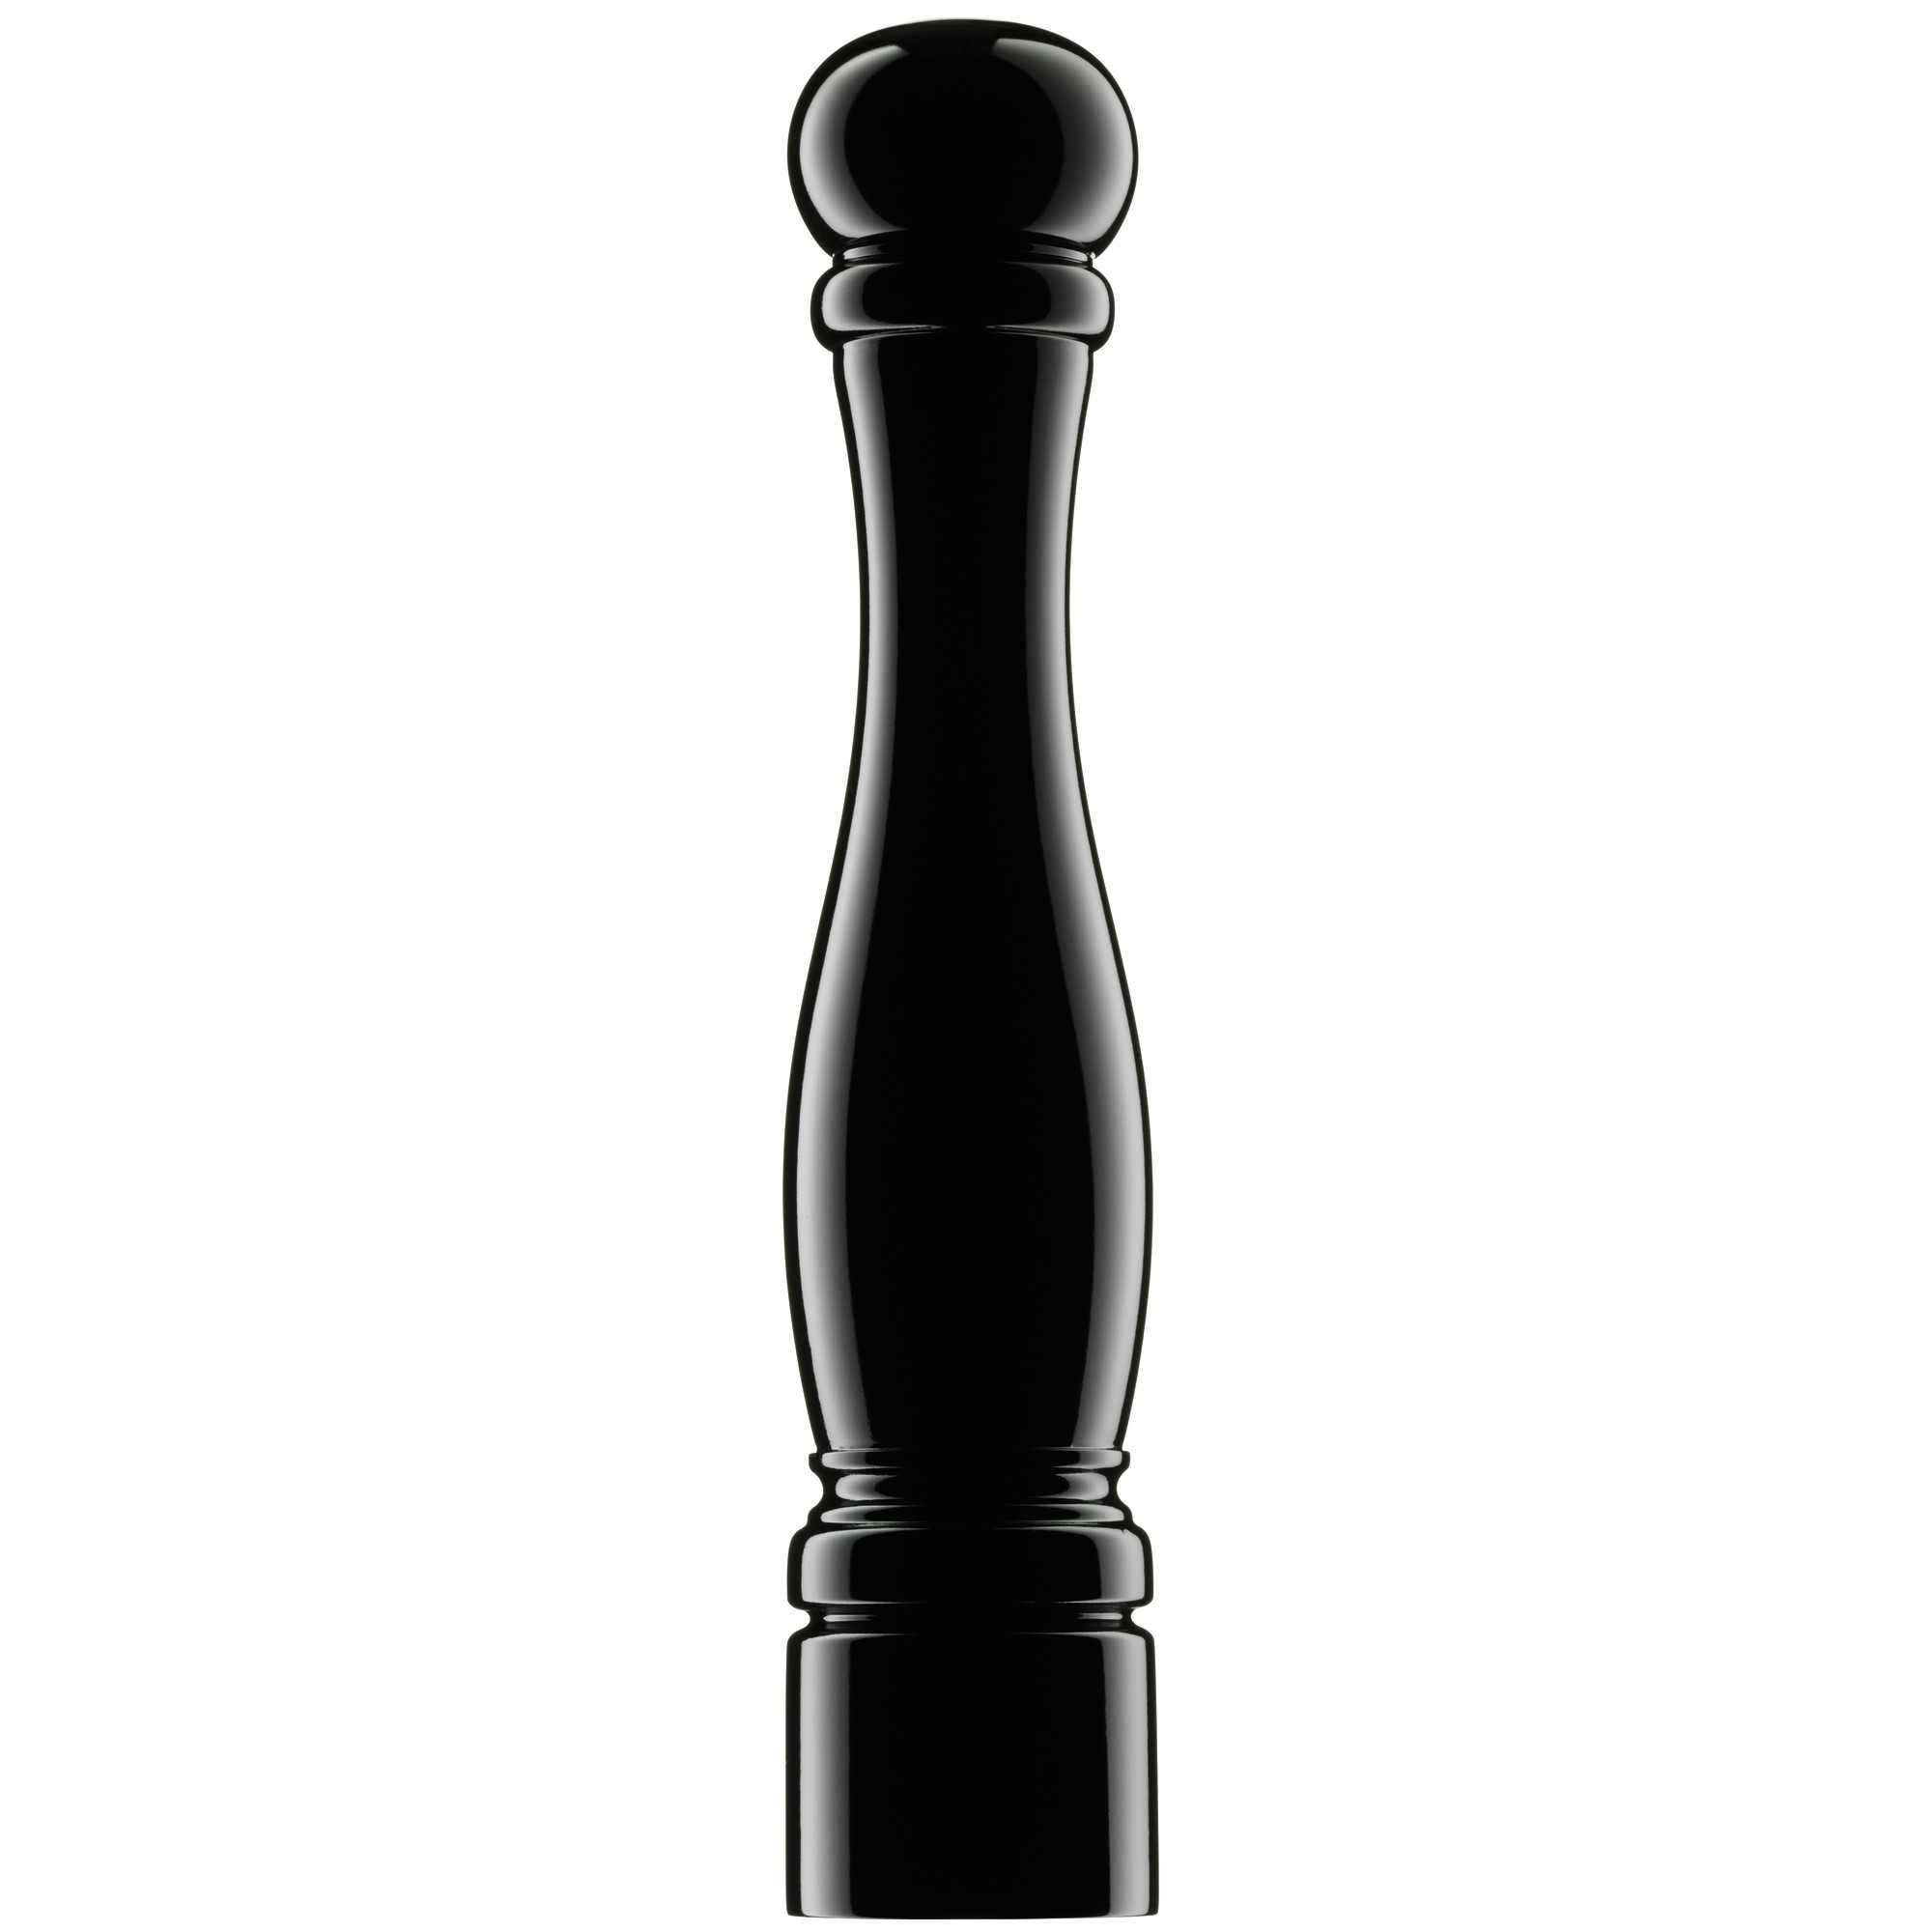 wmf ceramill salz pfefferm hle 40 cm holz schwarz. Black Bedroom Furniture Sets. Home Design Ideas